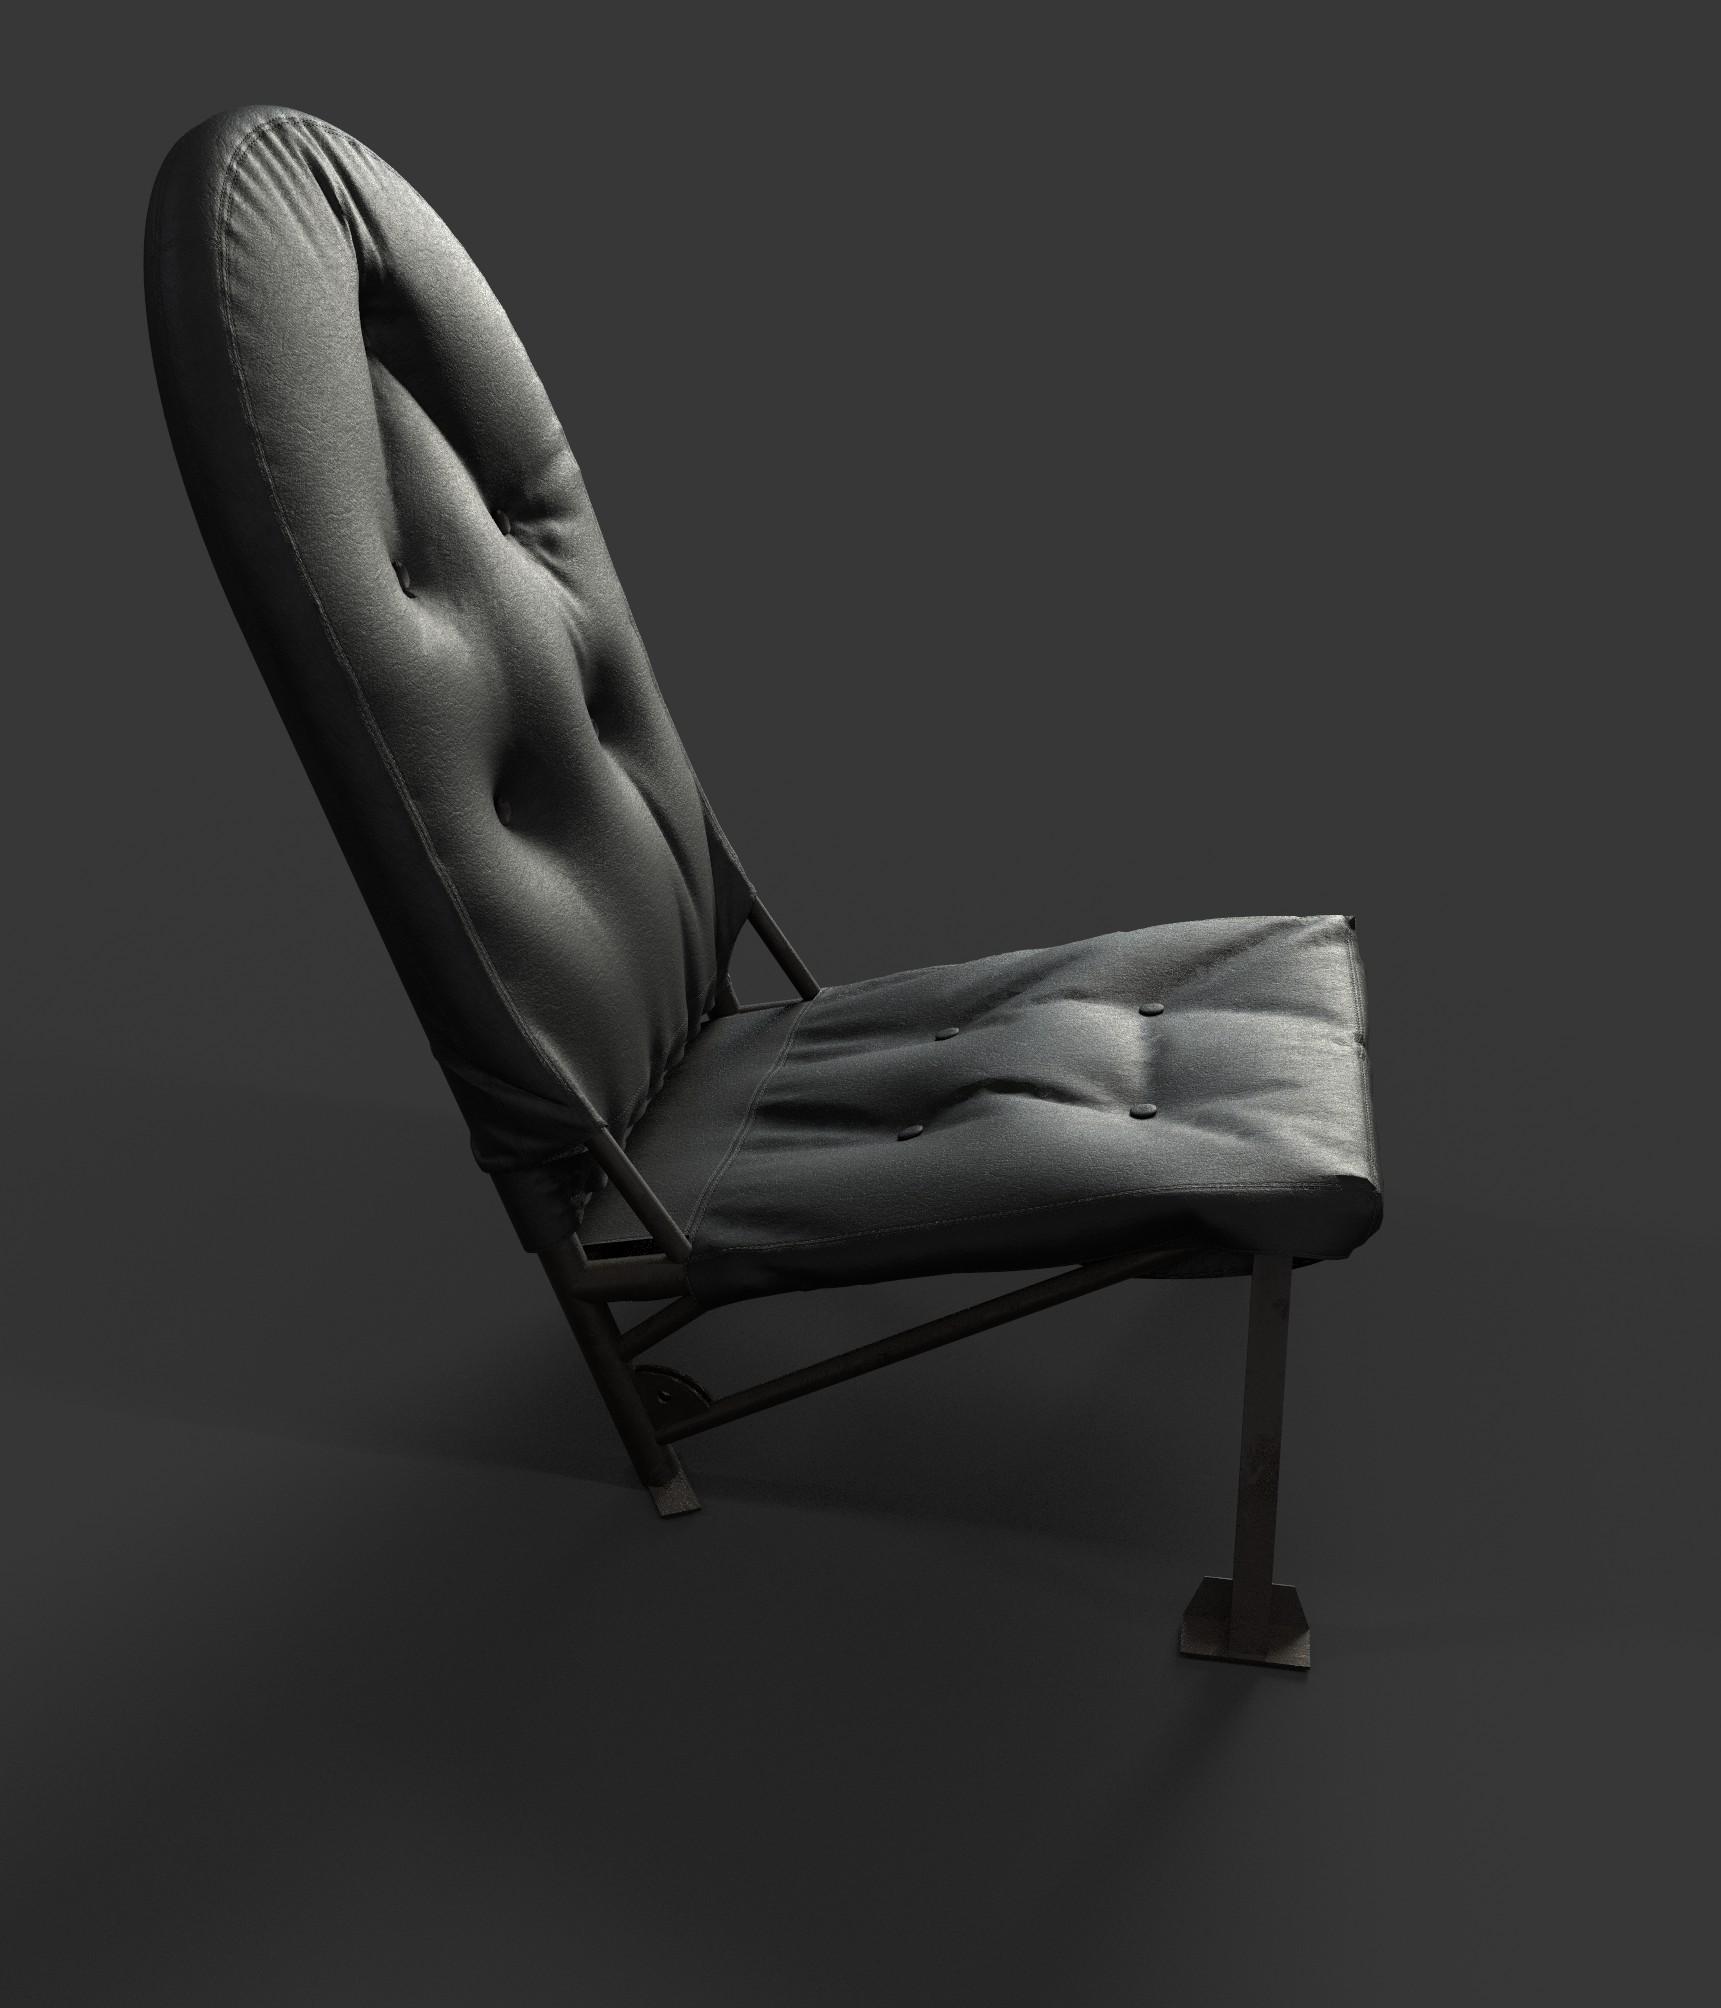 j3Cub-Seat07.jpg